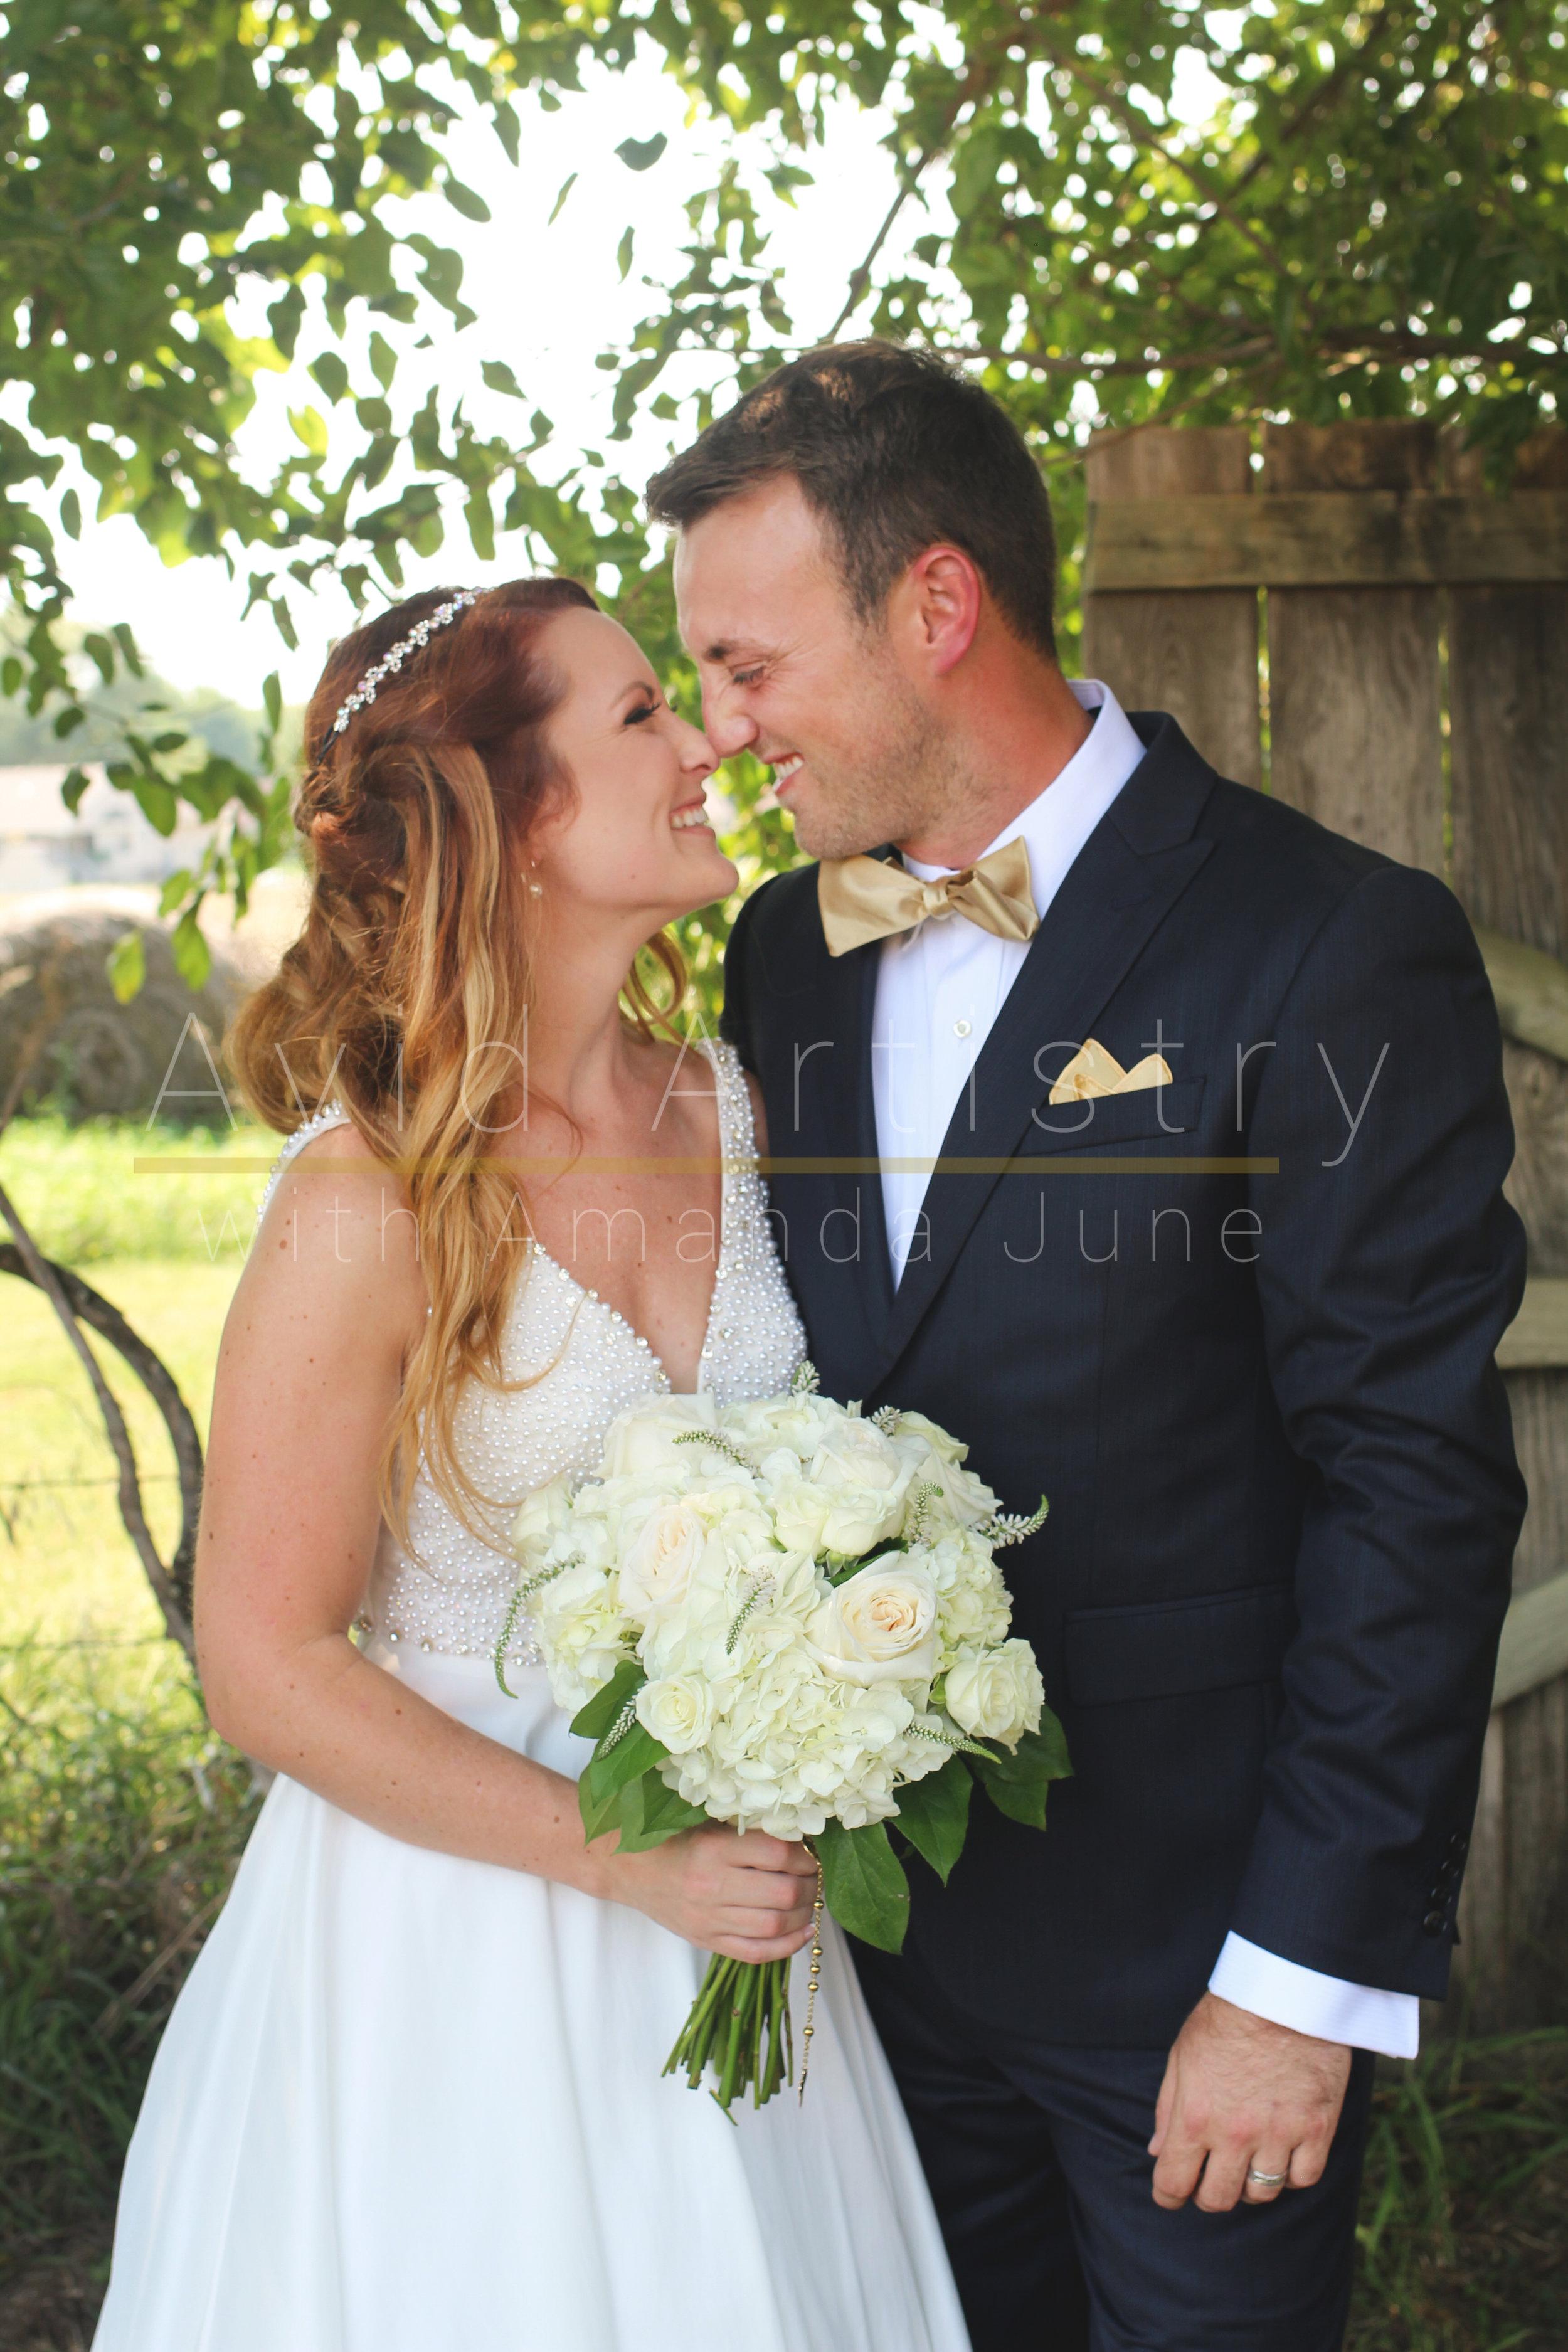 Wedding Photographer in Wichita, Ks. Avid Artistry